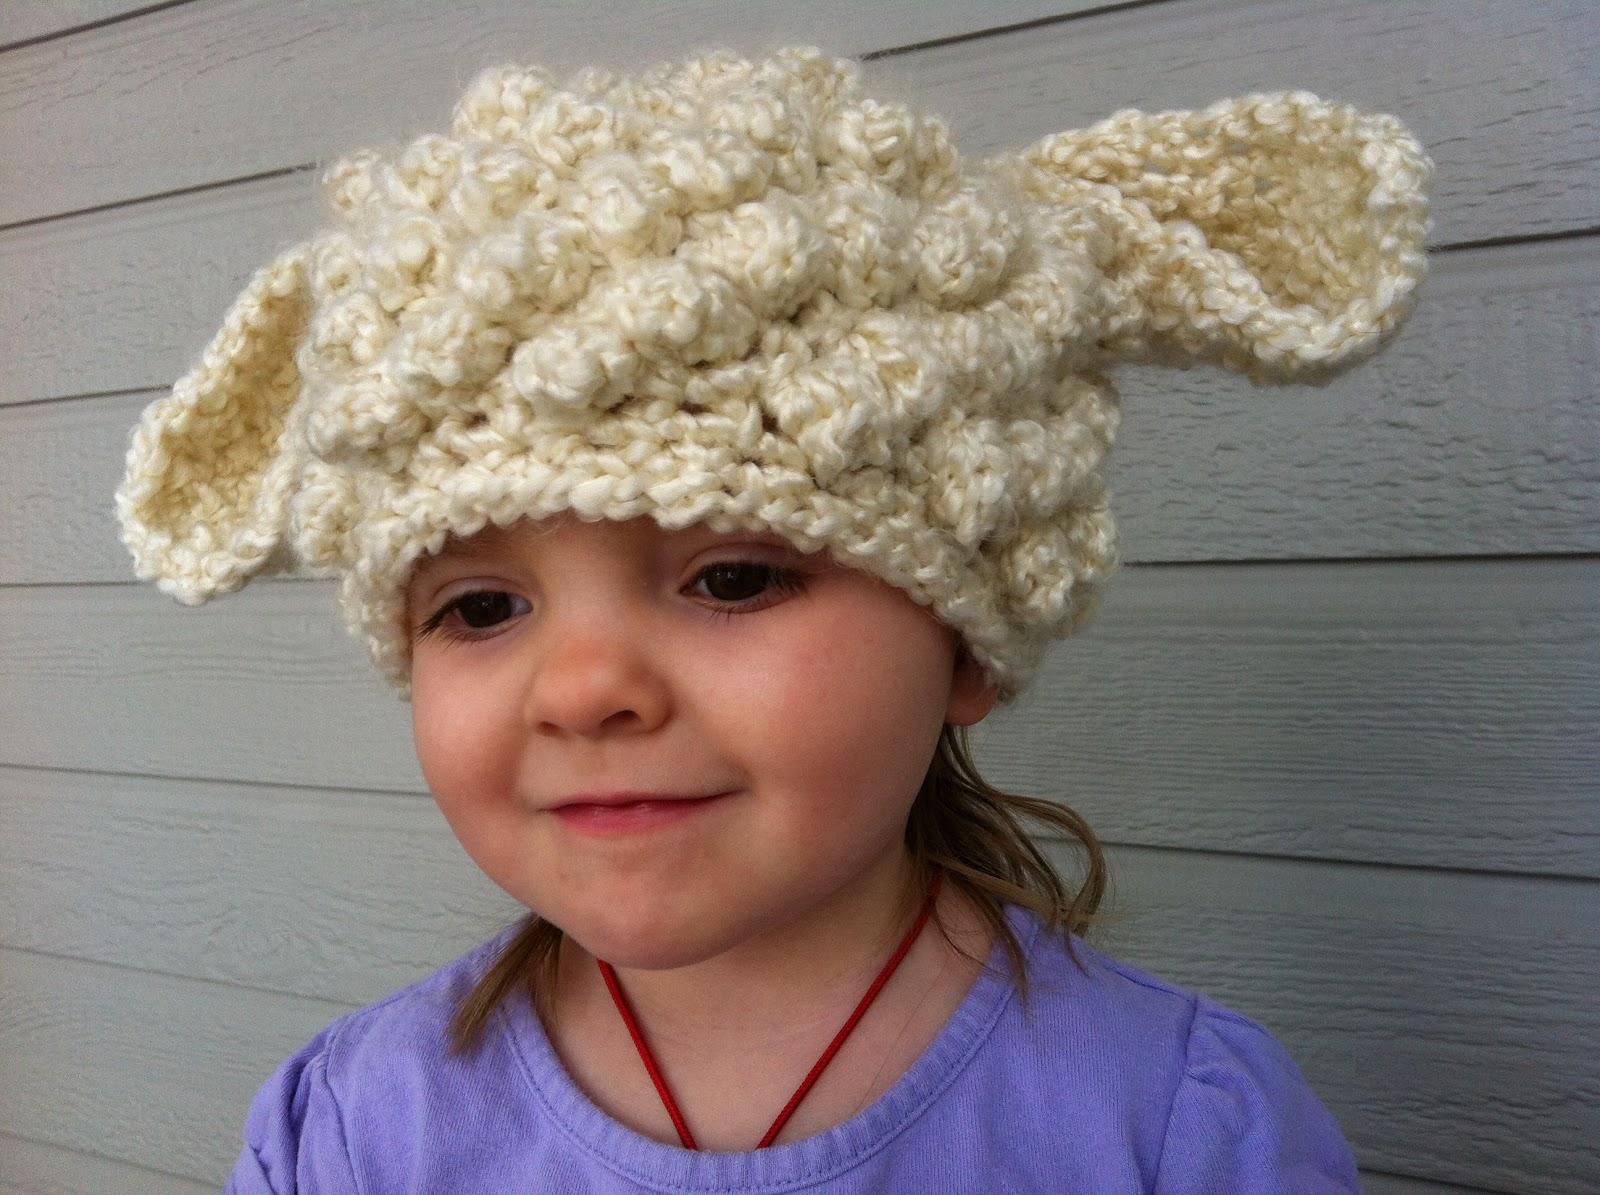 Crochet Pattern For A Lamb Hat : Design Adventures: Crochet Lamb Hat